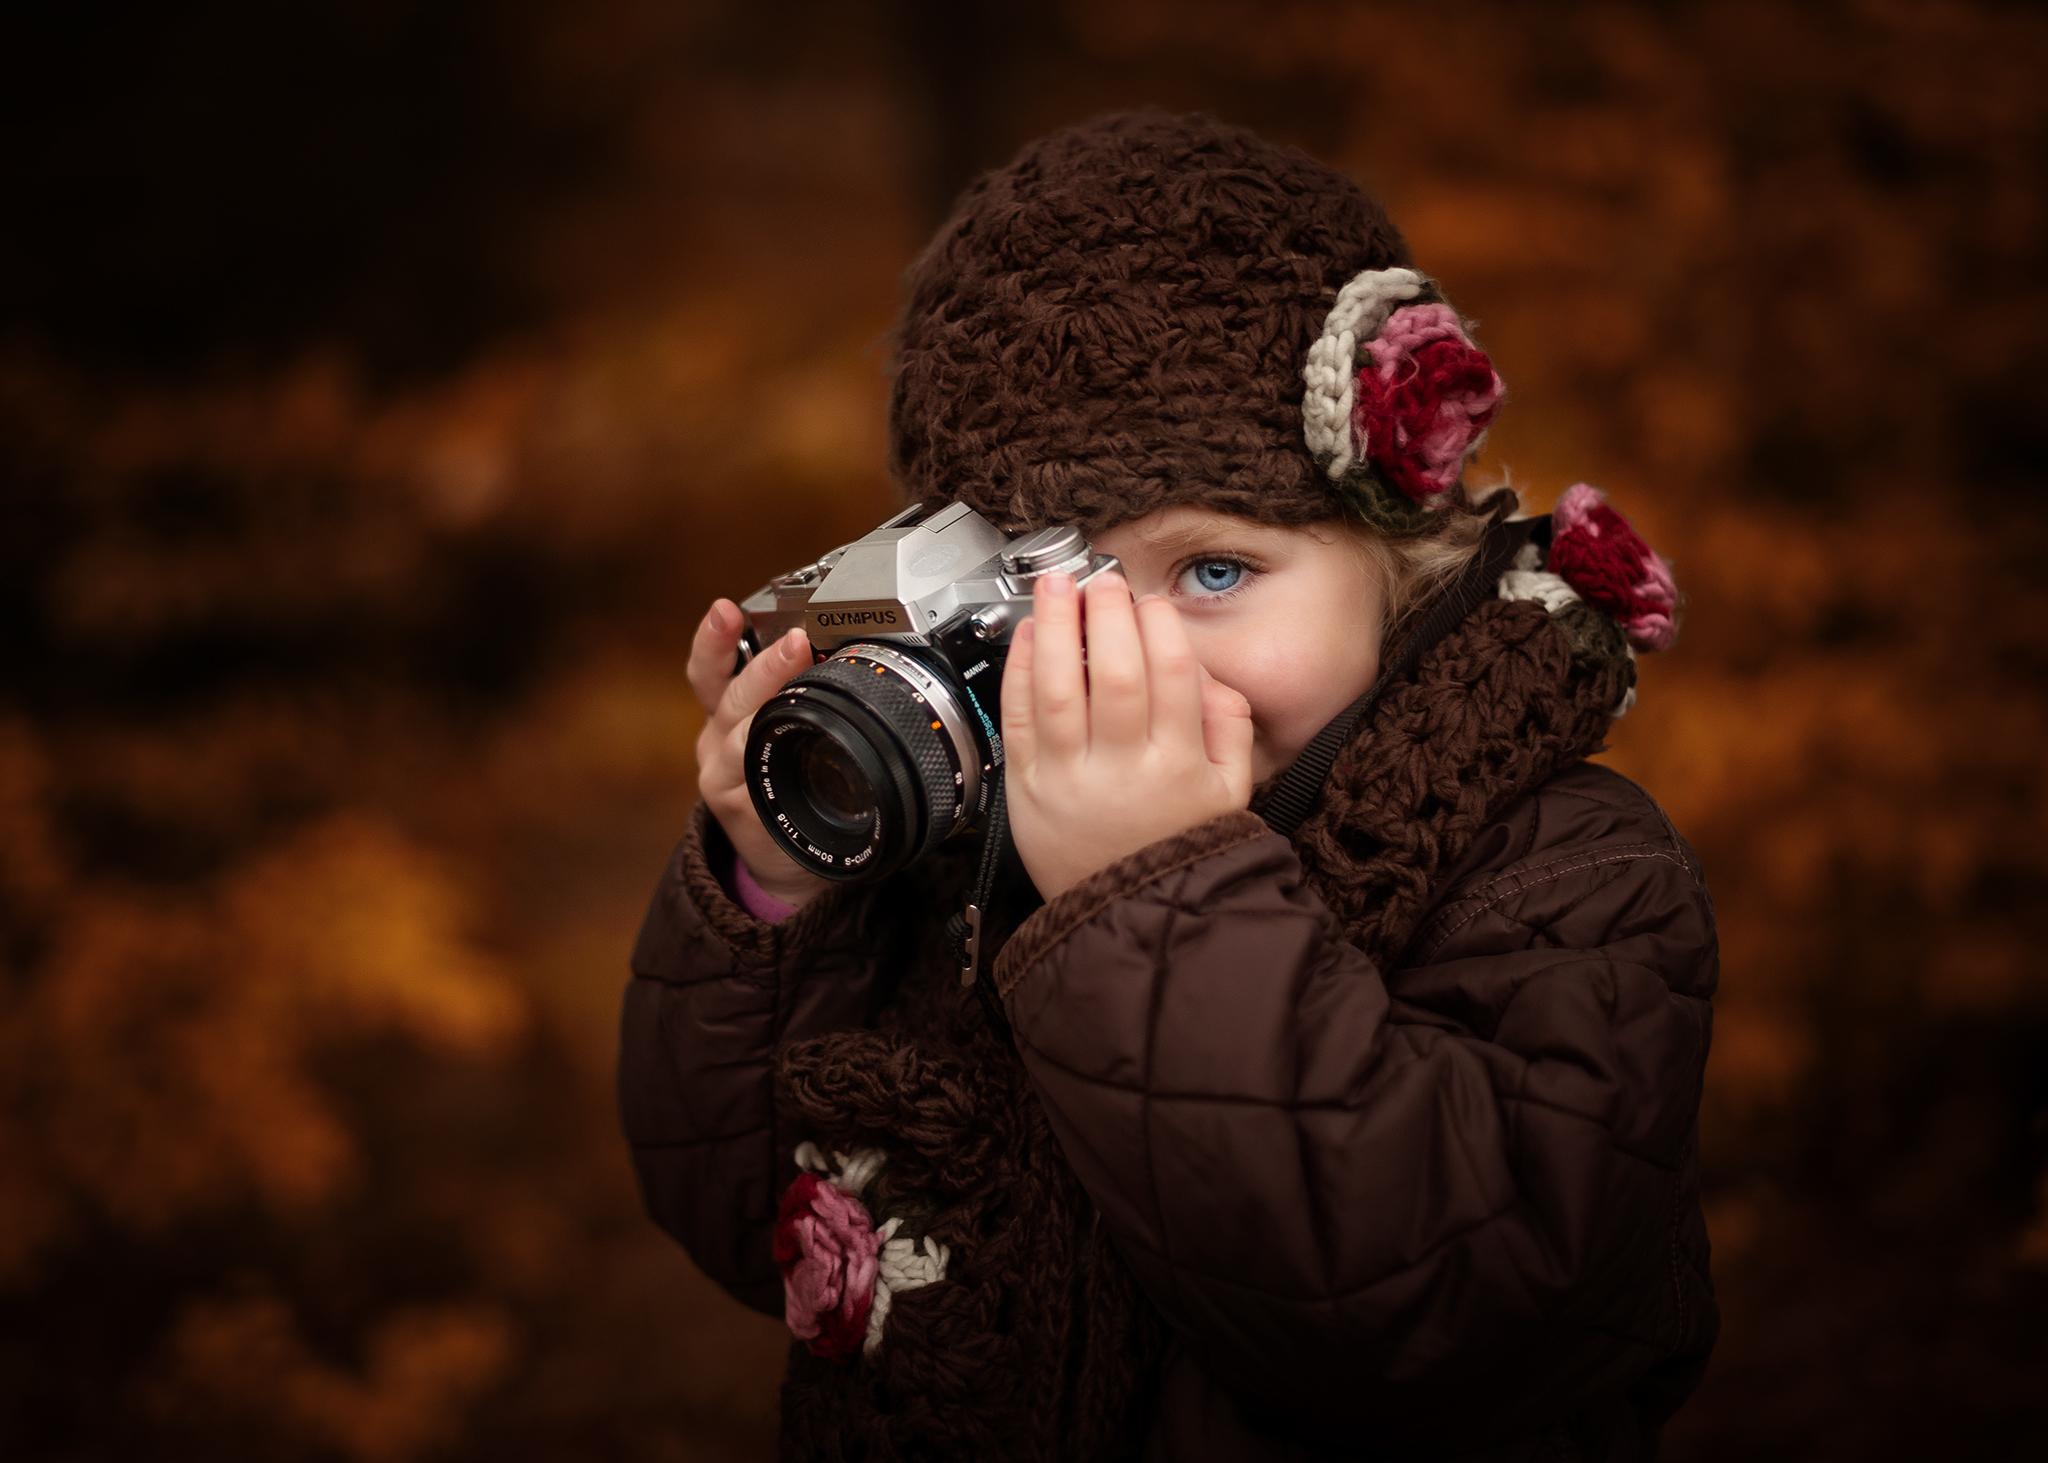 stock-photo-peep-126844273.jpg